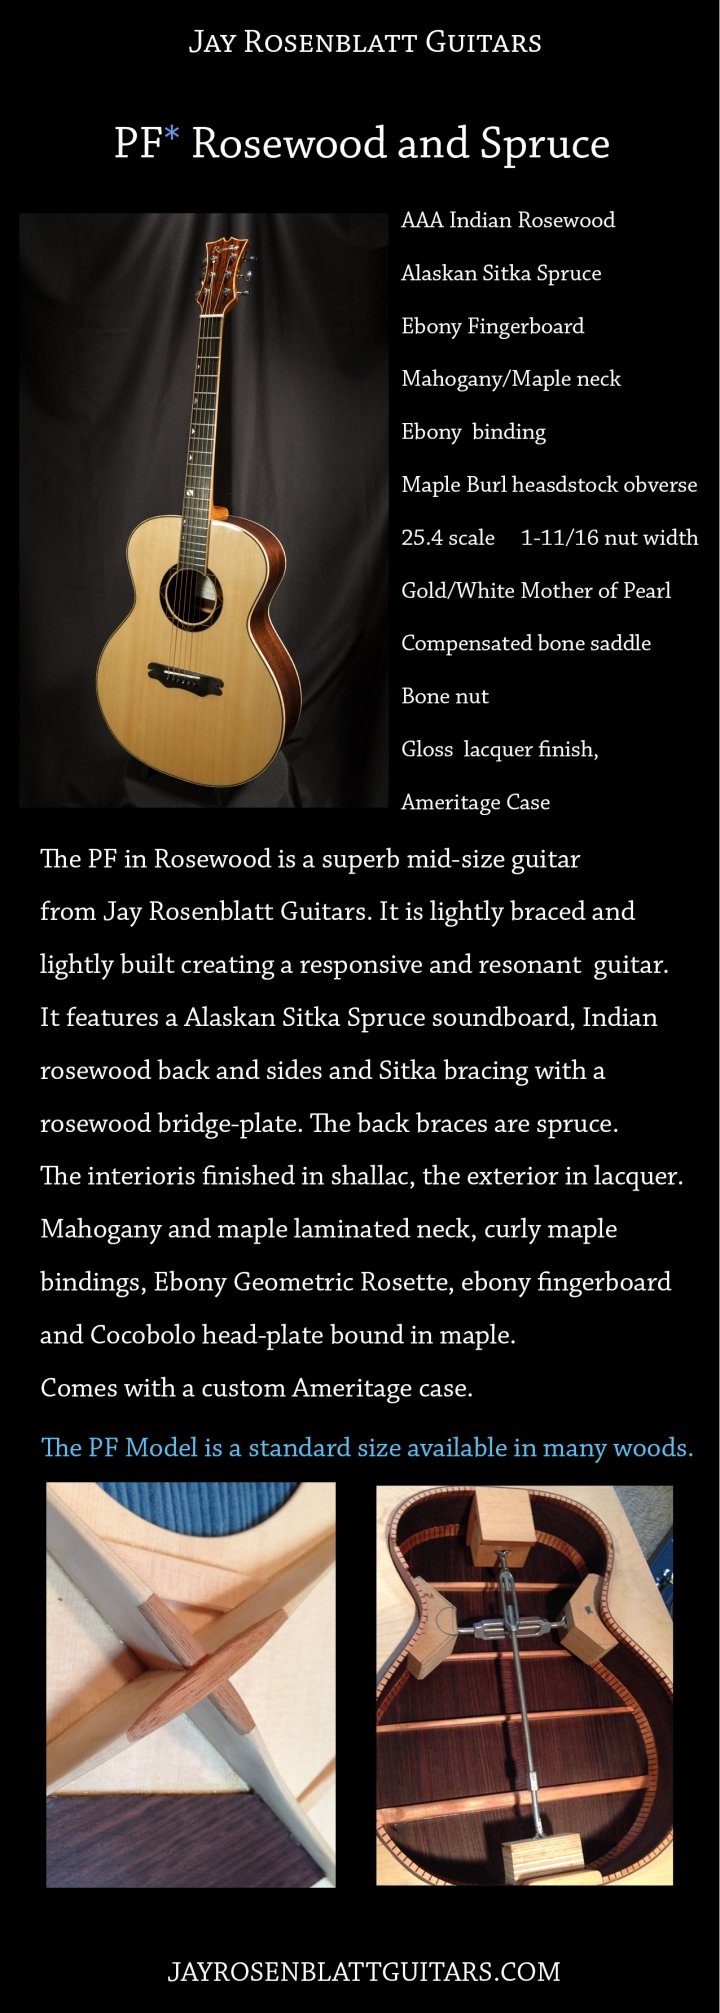 PF Model in Rosewood. Jay Rosenblatt Guitars.